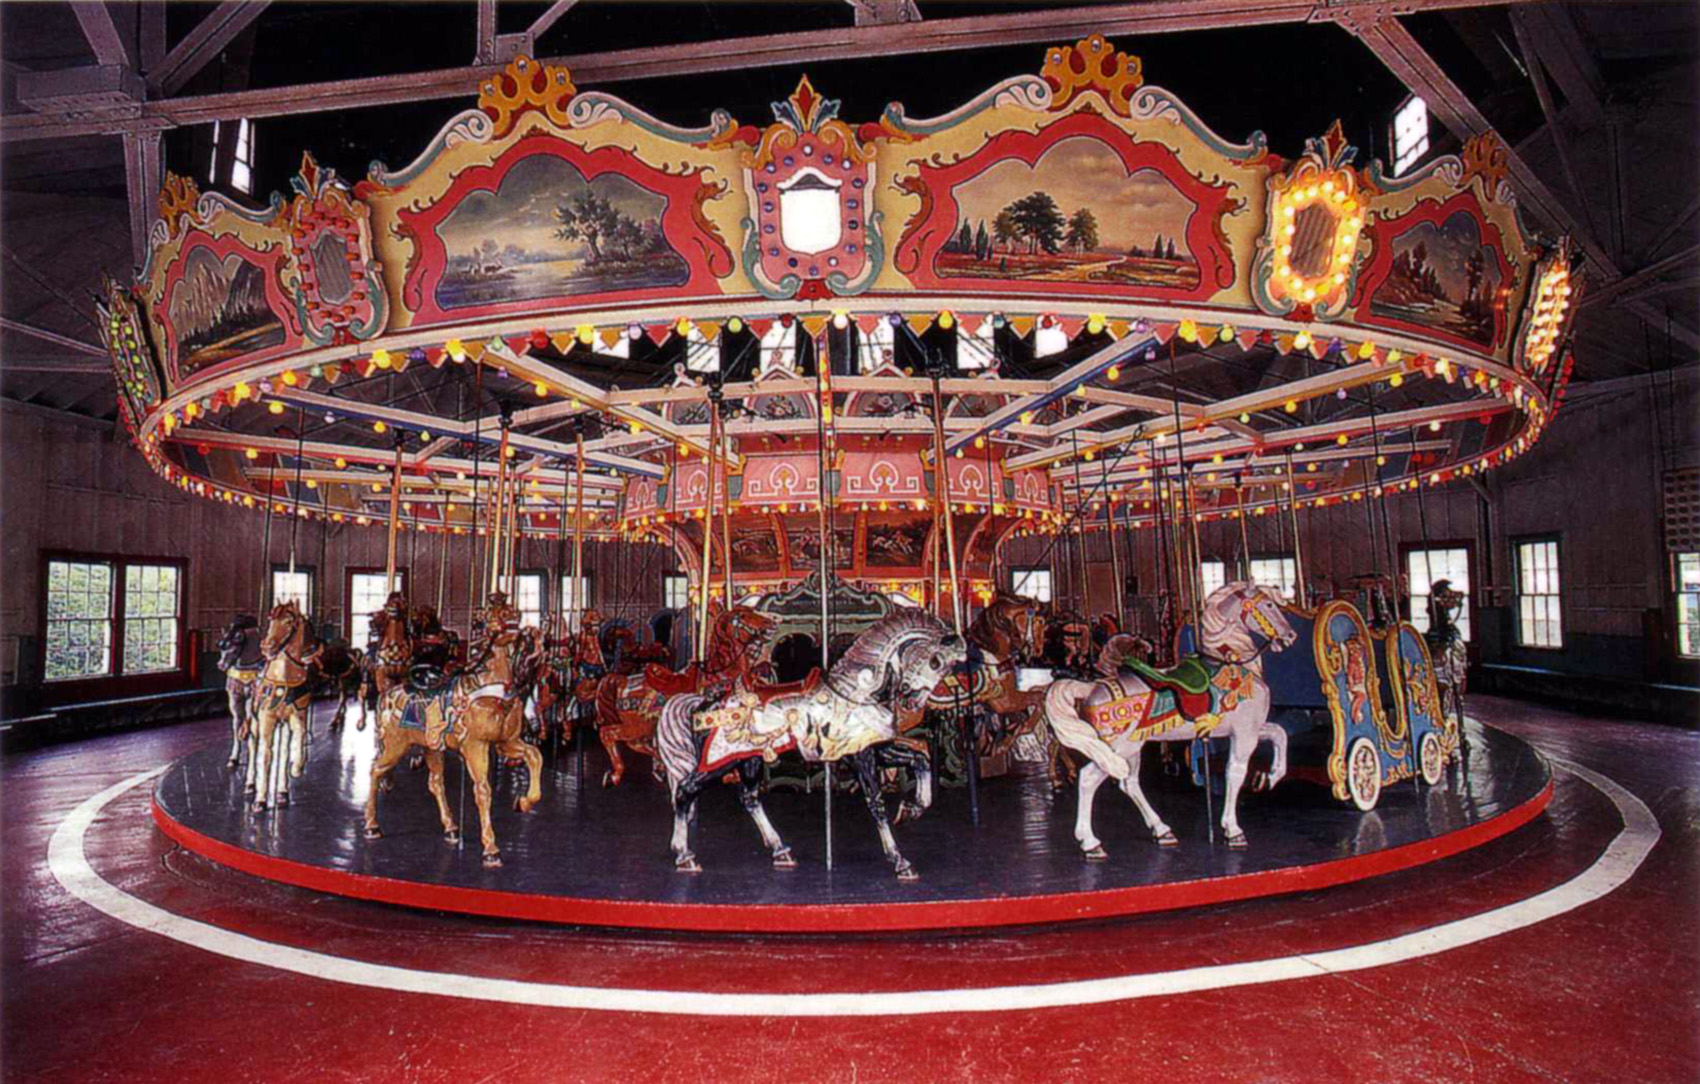 Holyoke-merry-go-round-PTC-80-postcard